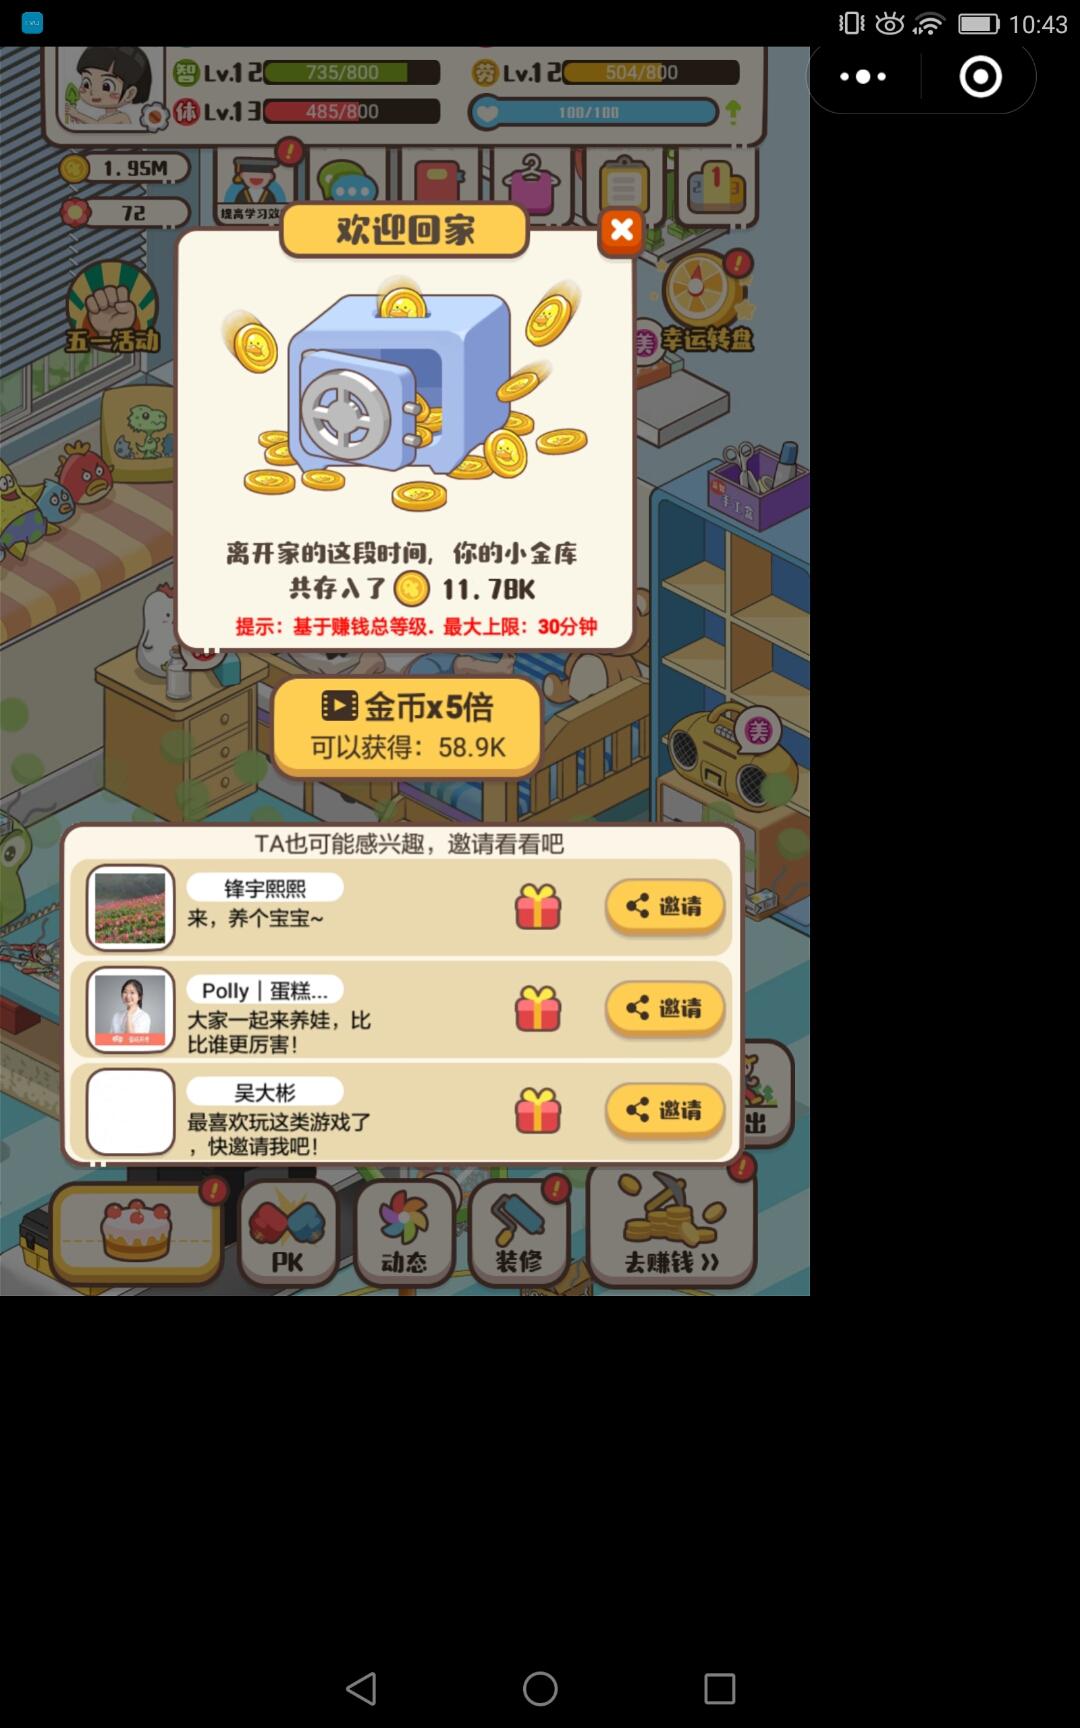 Screenshot_2020-05-10-10-43-12.png